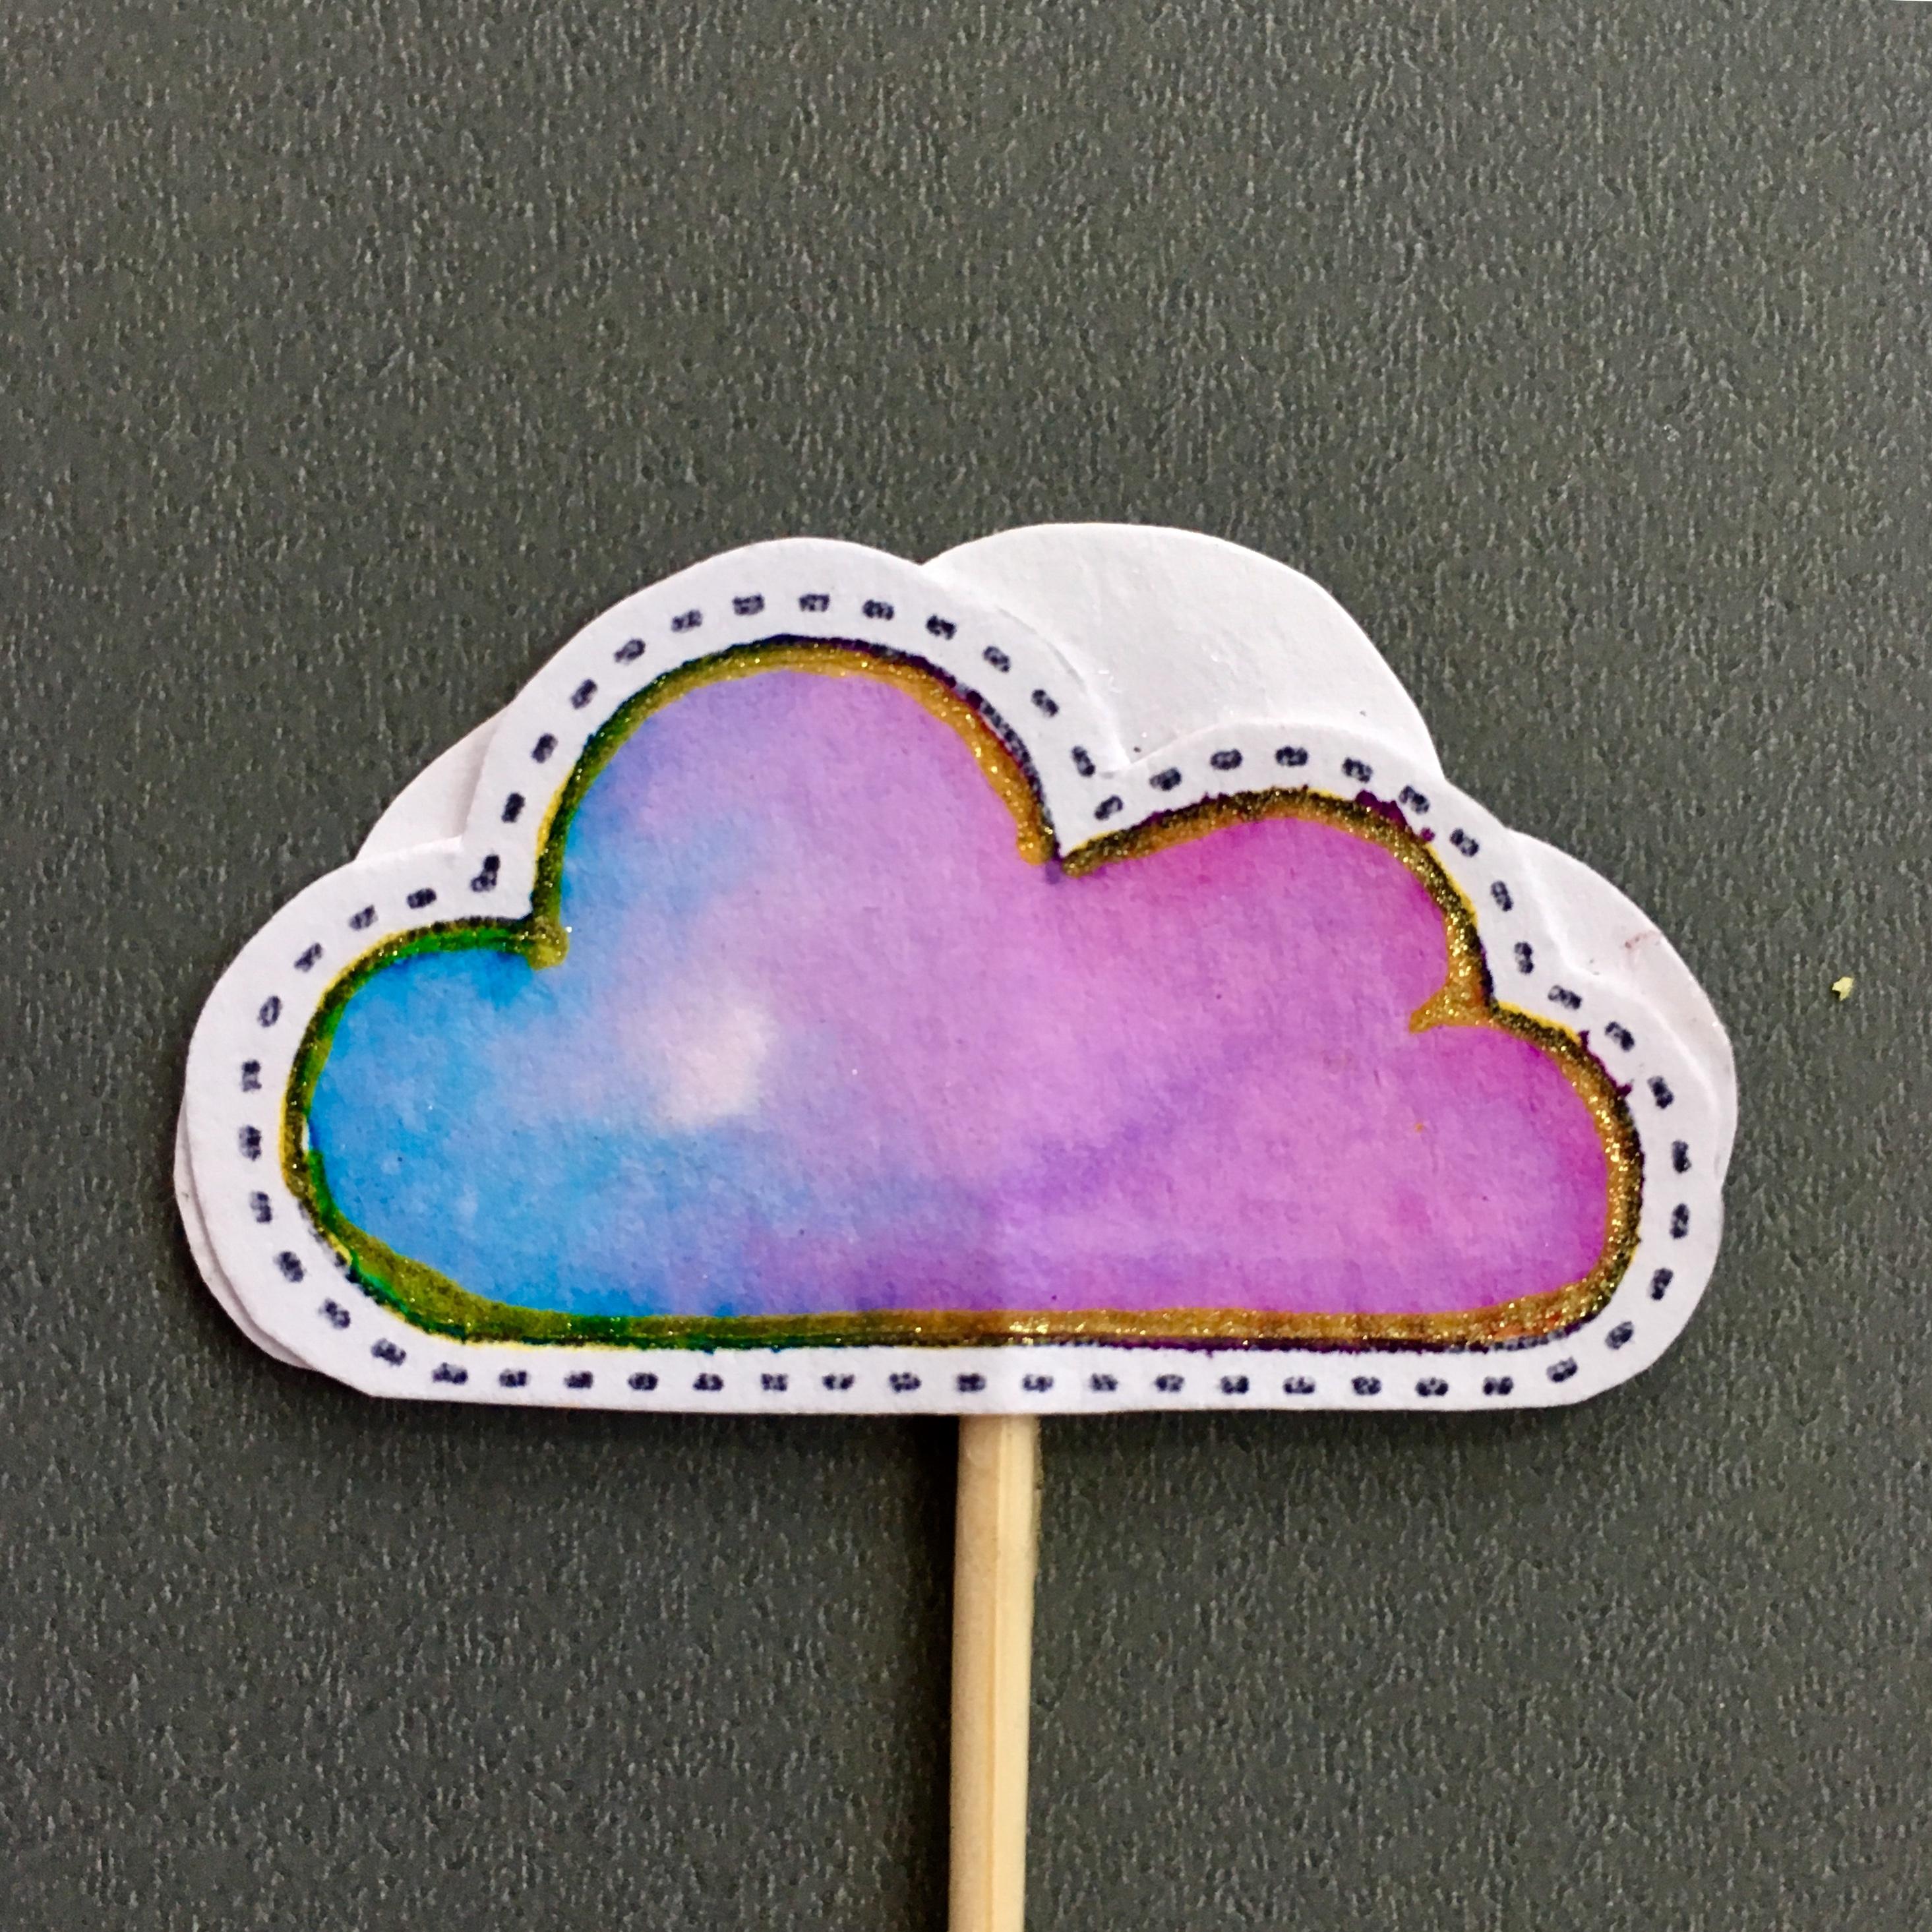 paper cloud muffin topper in purple and blue